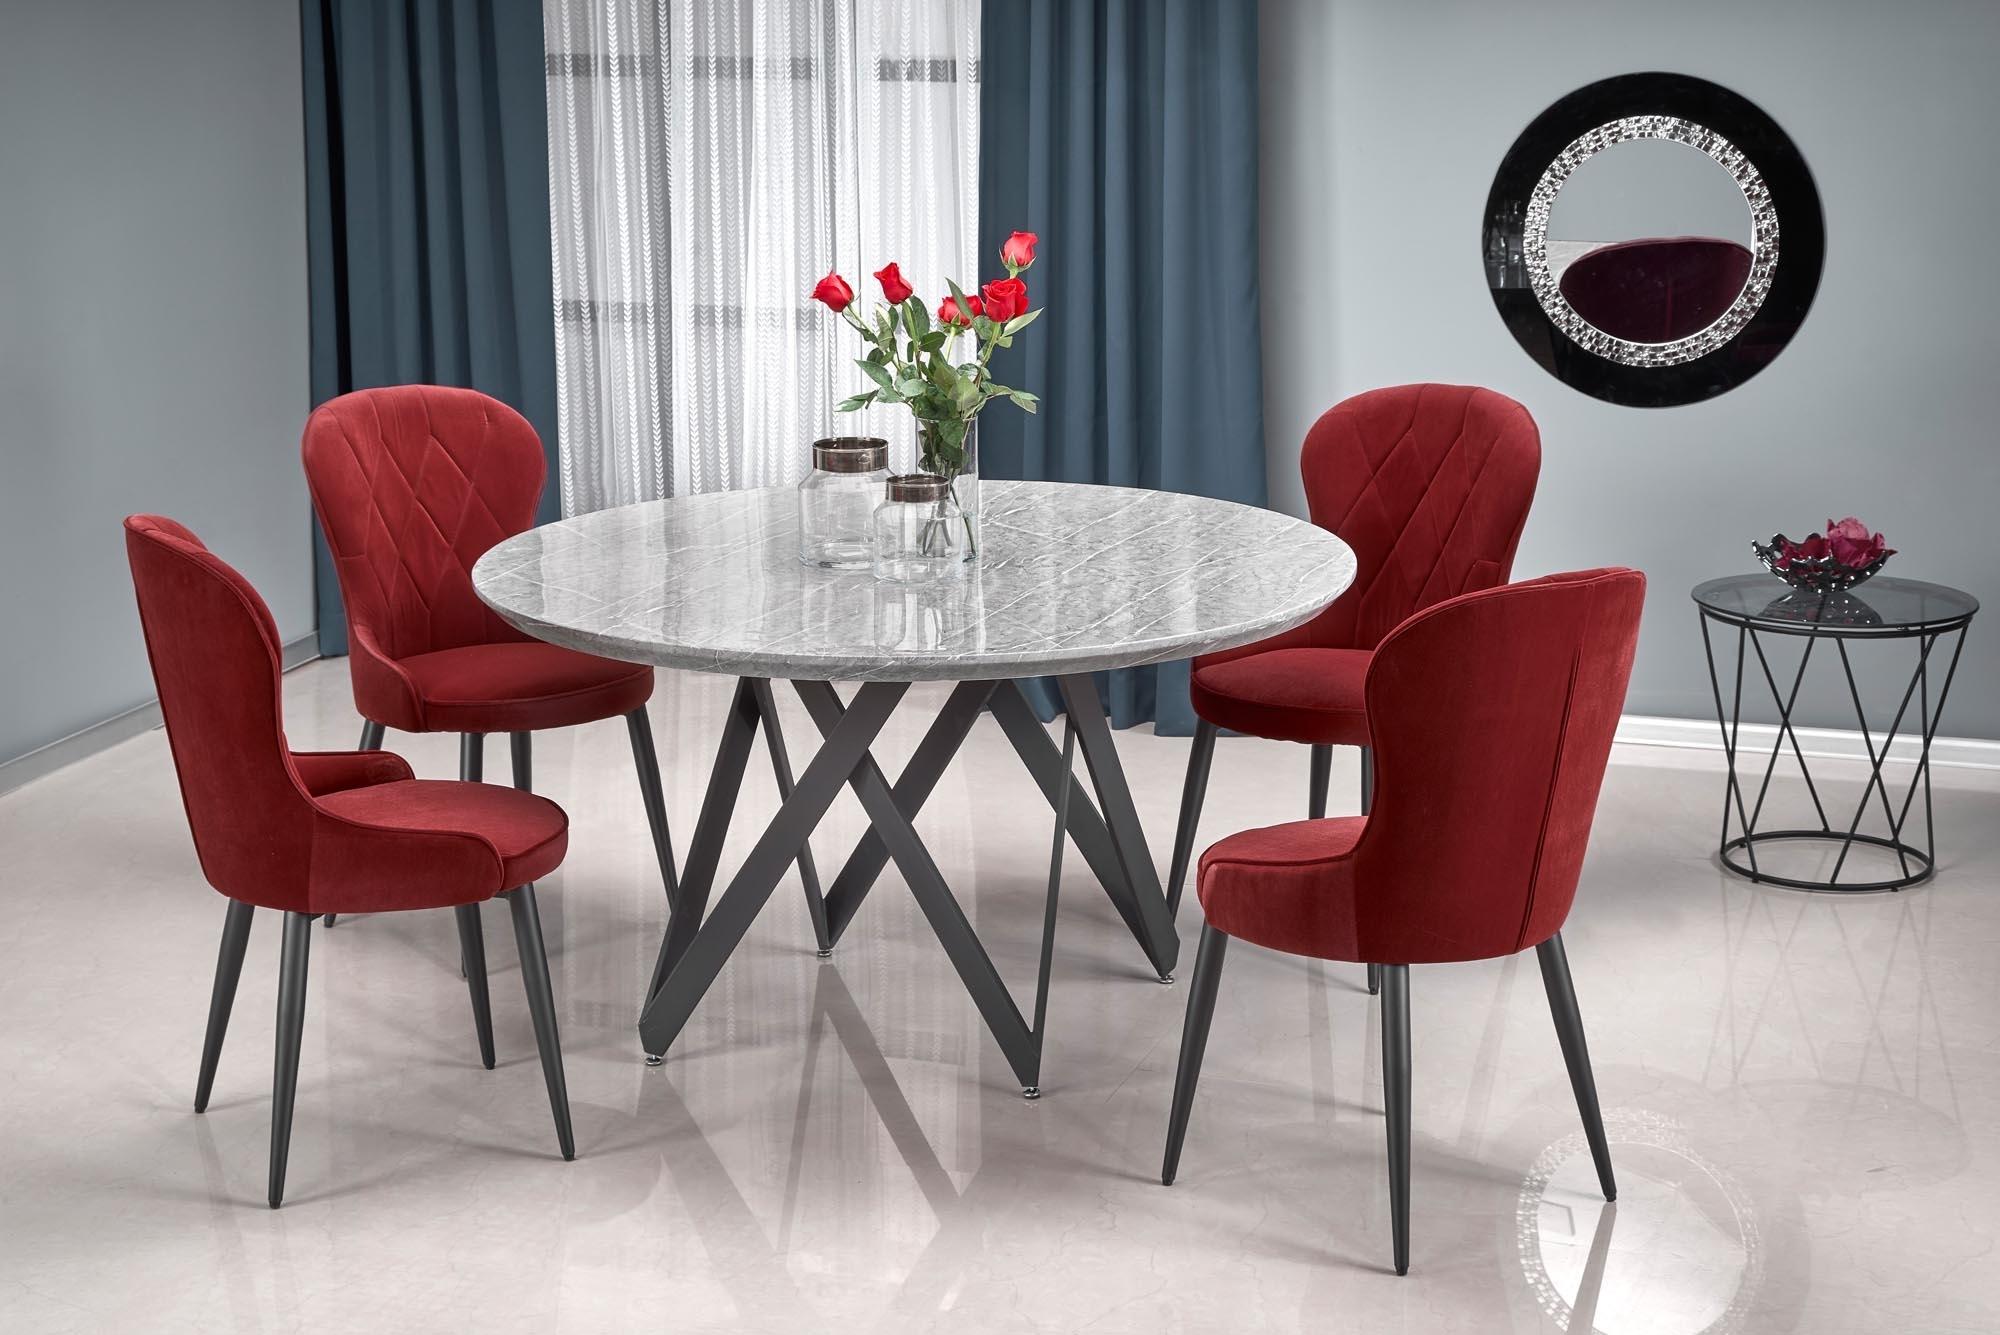 Set masa din MDF si metal Gustimo Gri / Negru + 4 scaune tapitate cu stofa K366 Bordeaux / Negru, Ø140xH77 cm somproduct.ro